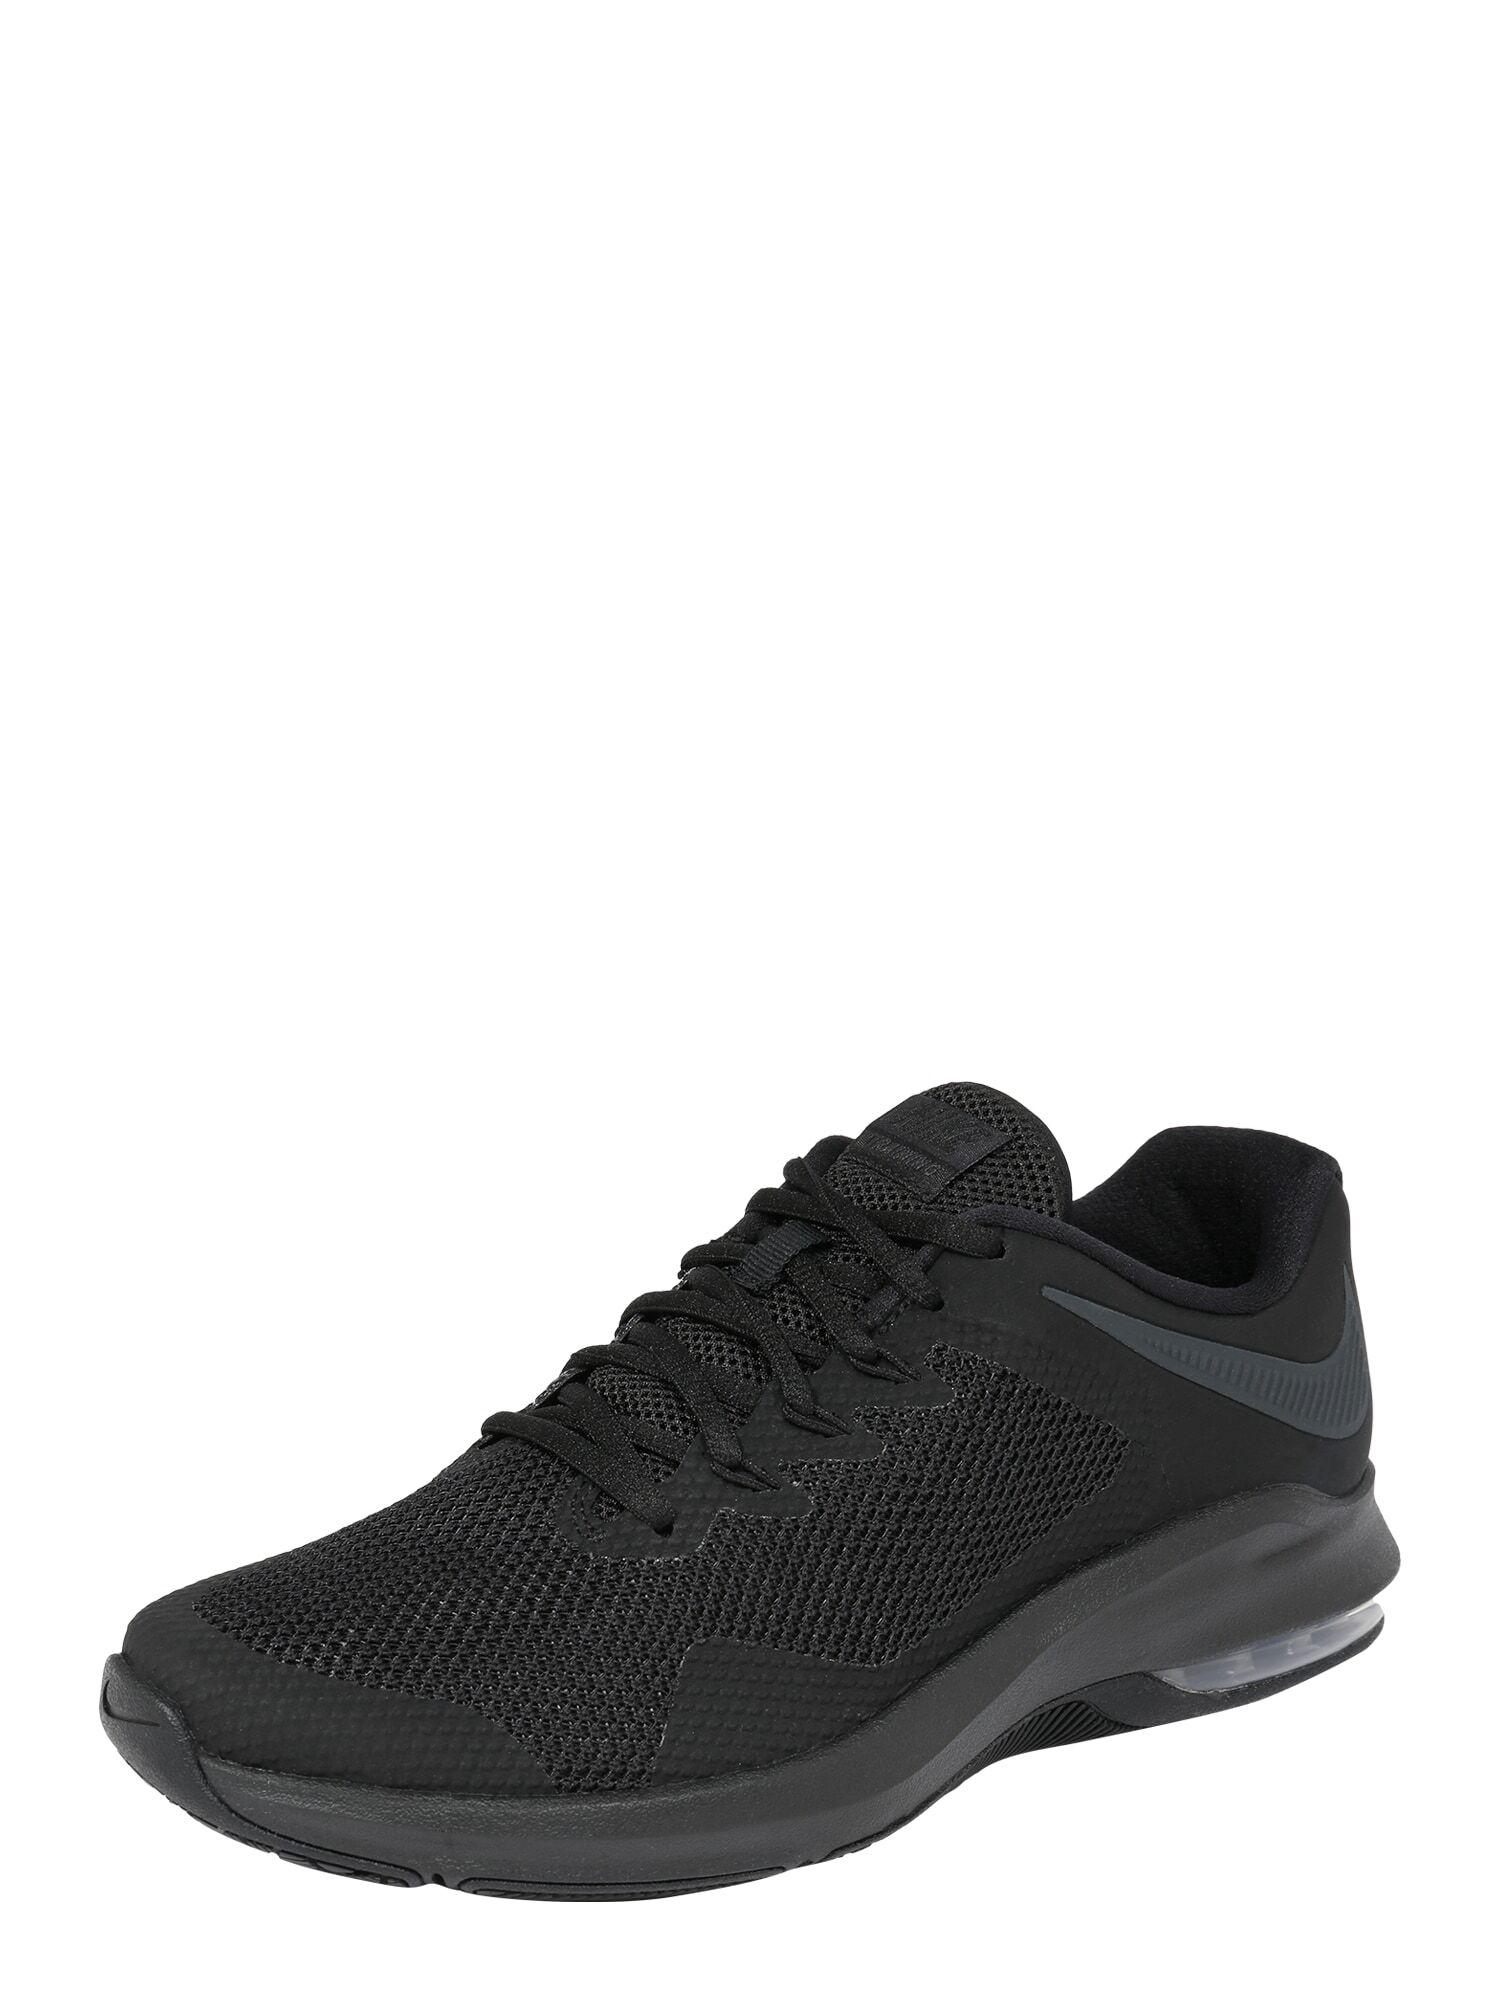 NIKE Chaussure de sport 'Alpha Trainer'  - Noir - Taille: 10 - male